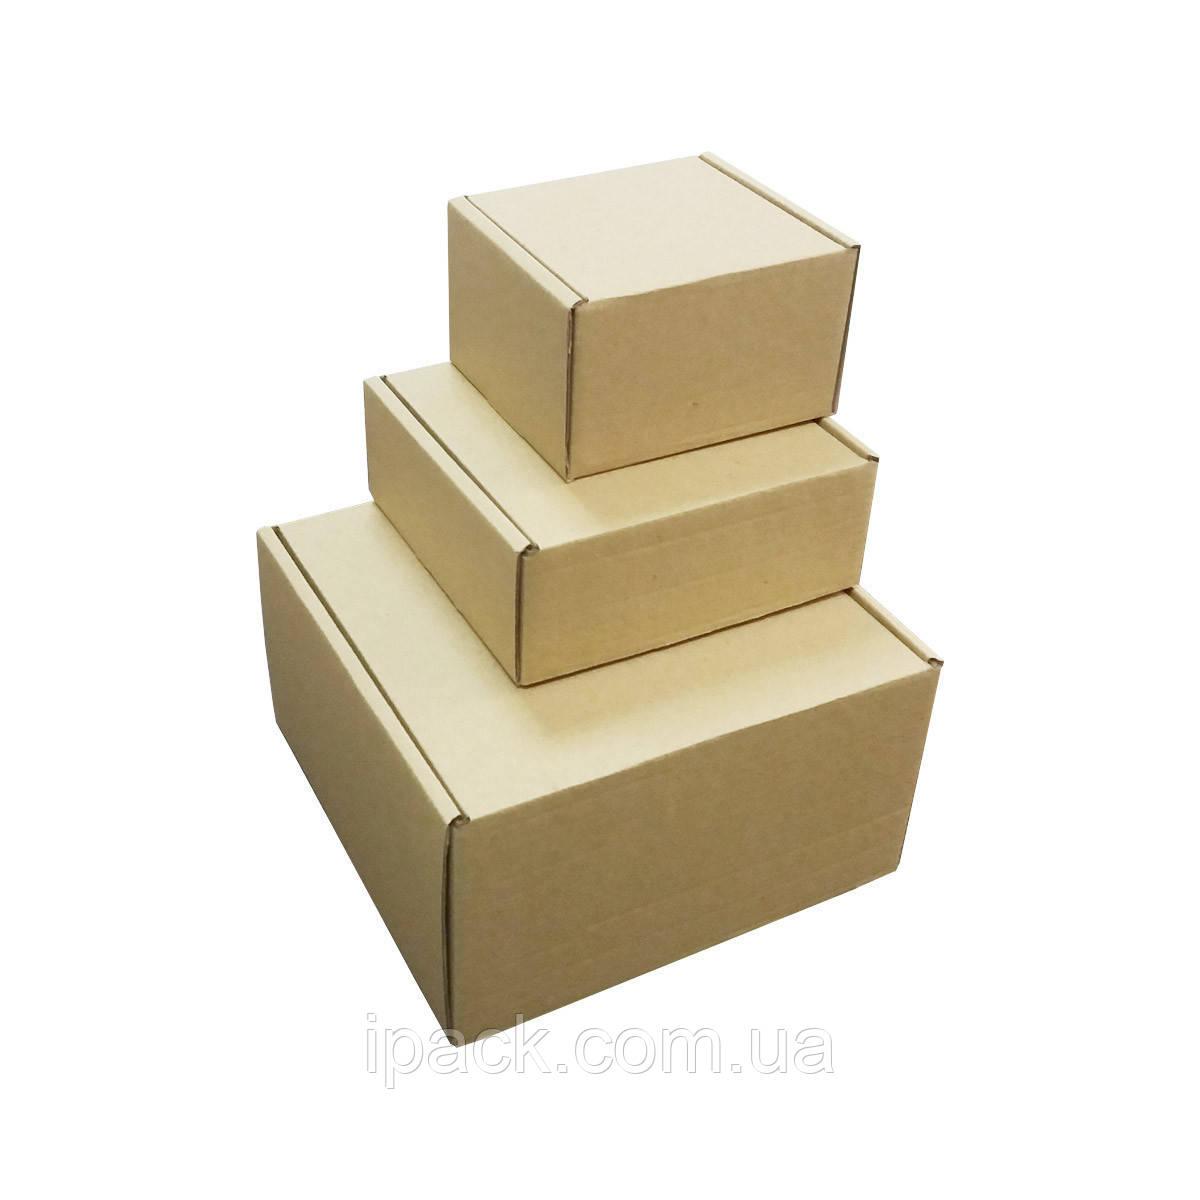 Коробка картонная самосборная, 115*115*145, мм, бурая, крафт, микрогофрокартон